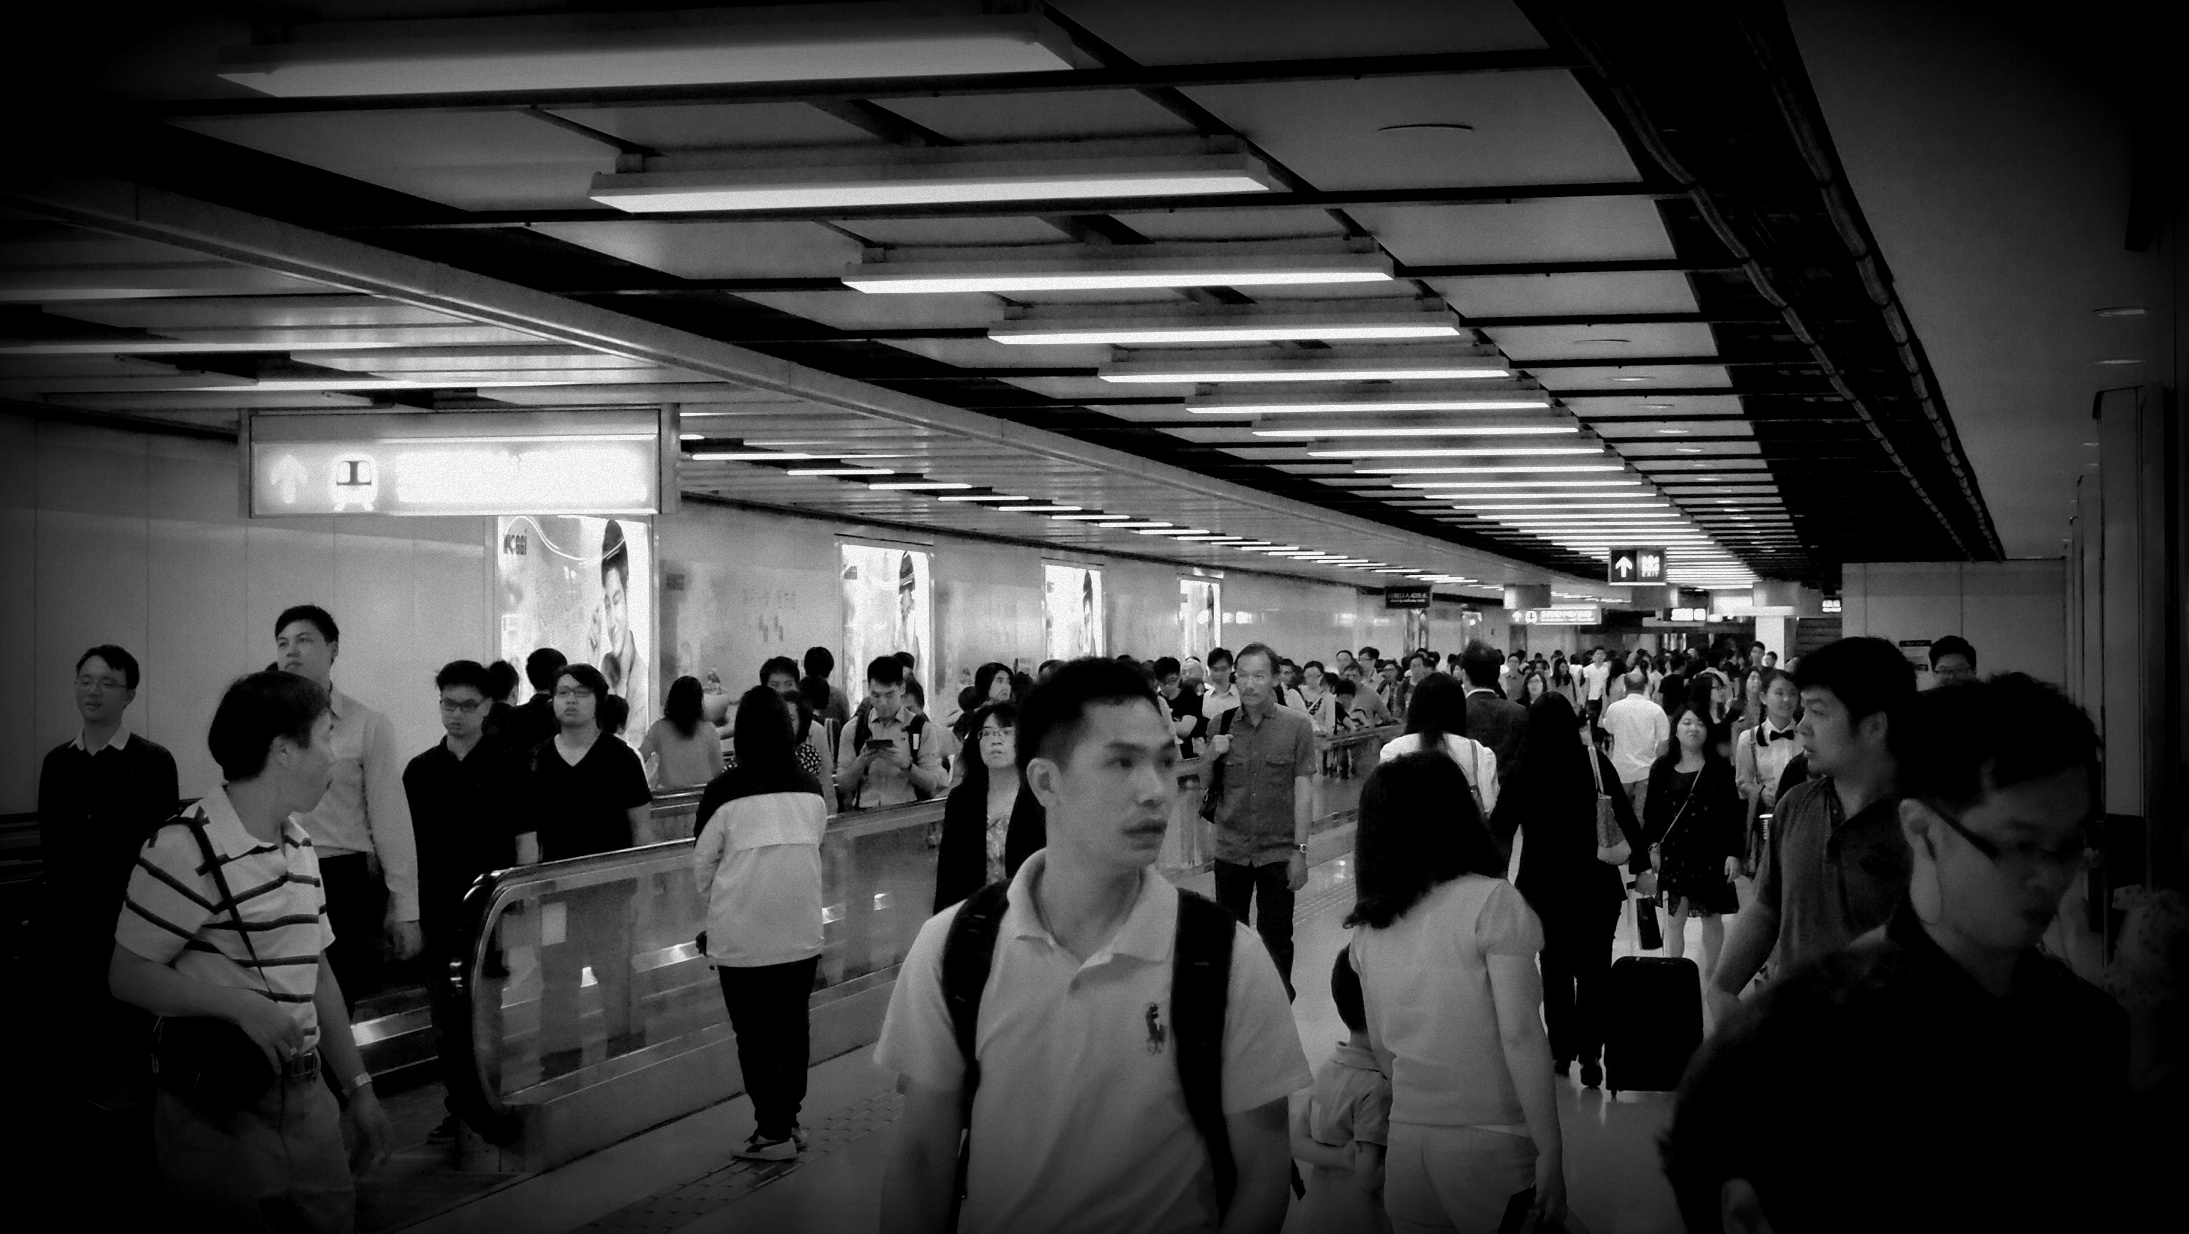 The rush hour mob